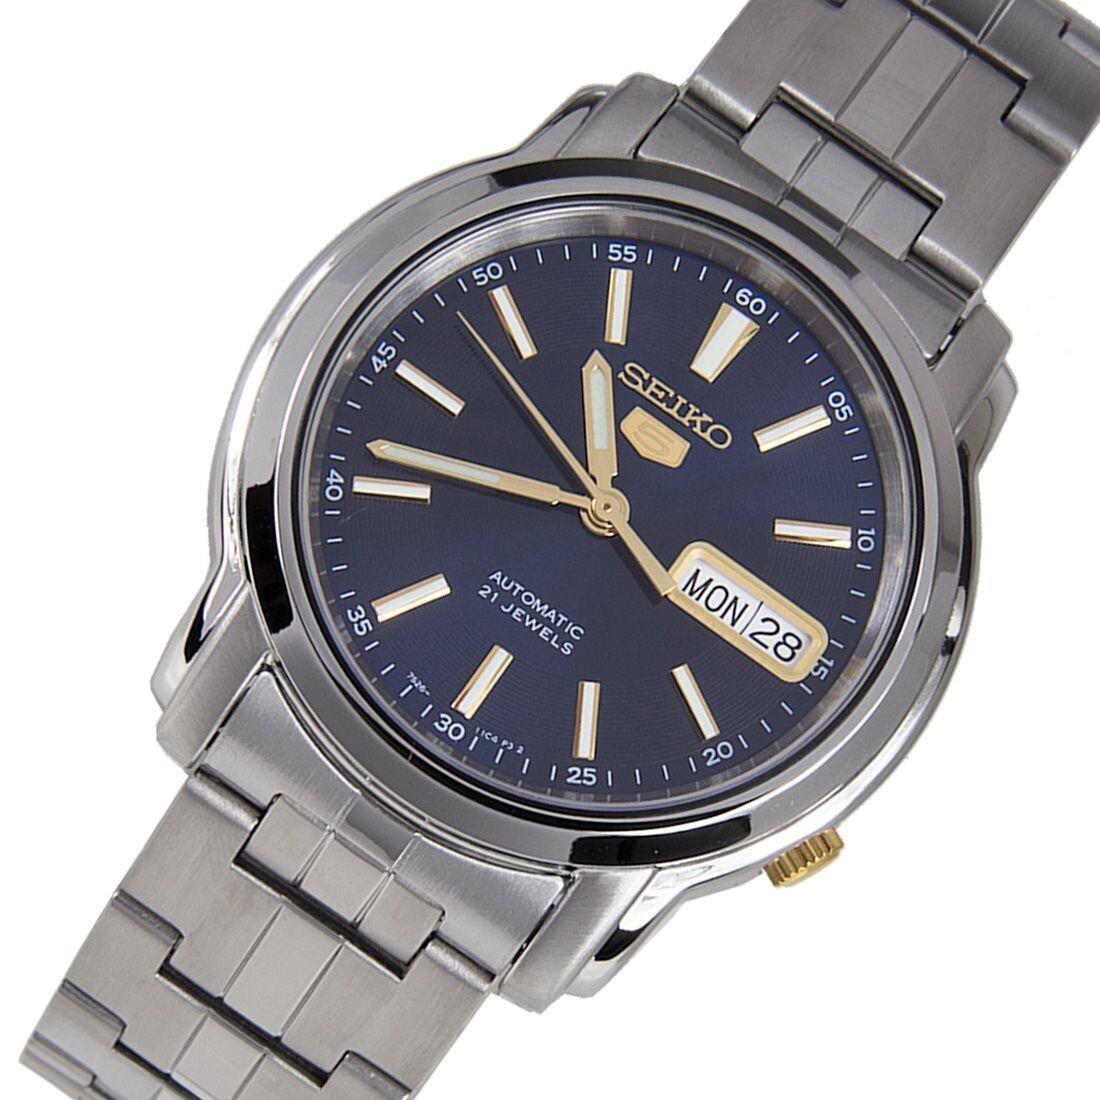 reloj automático hombre Seiko 5 SNKL79K1 dial azul 37mm correa acero